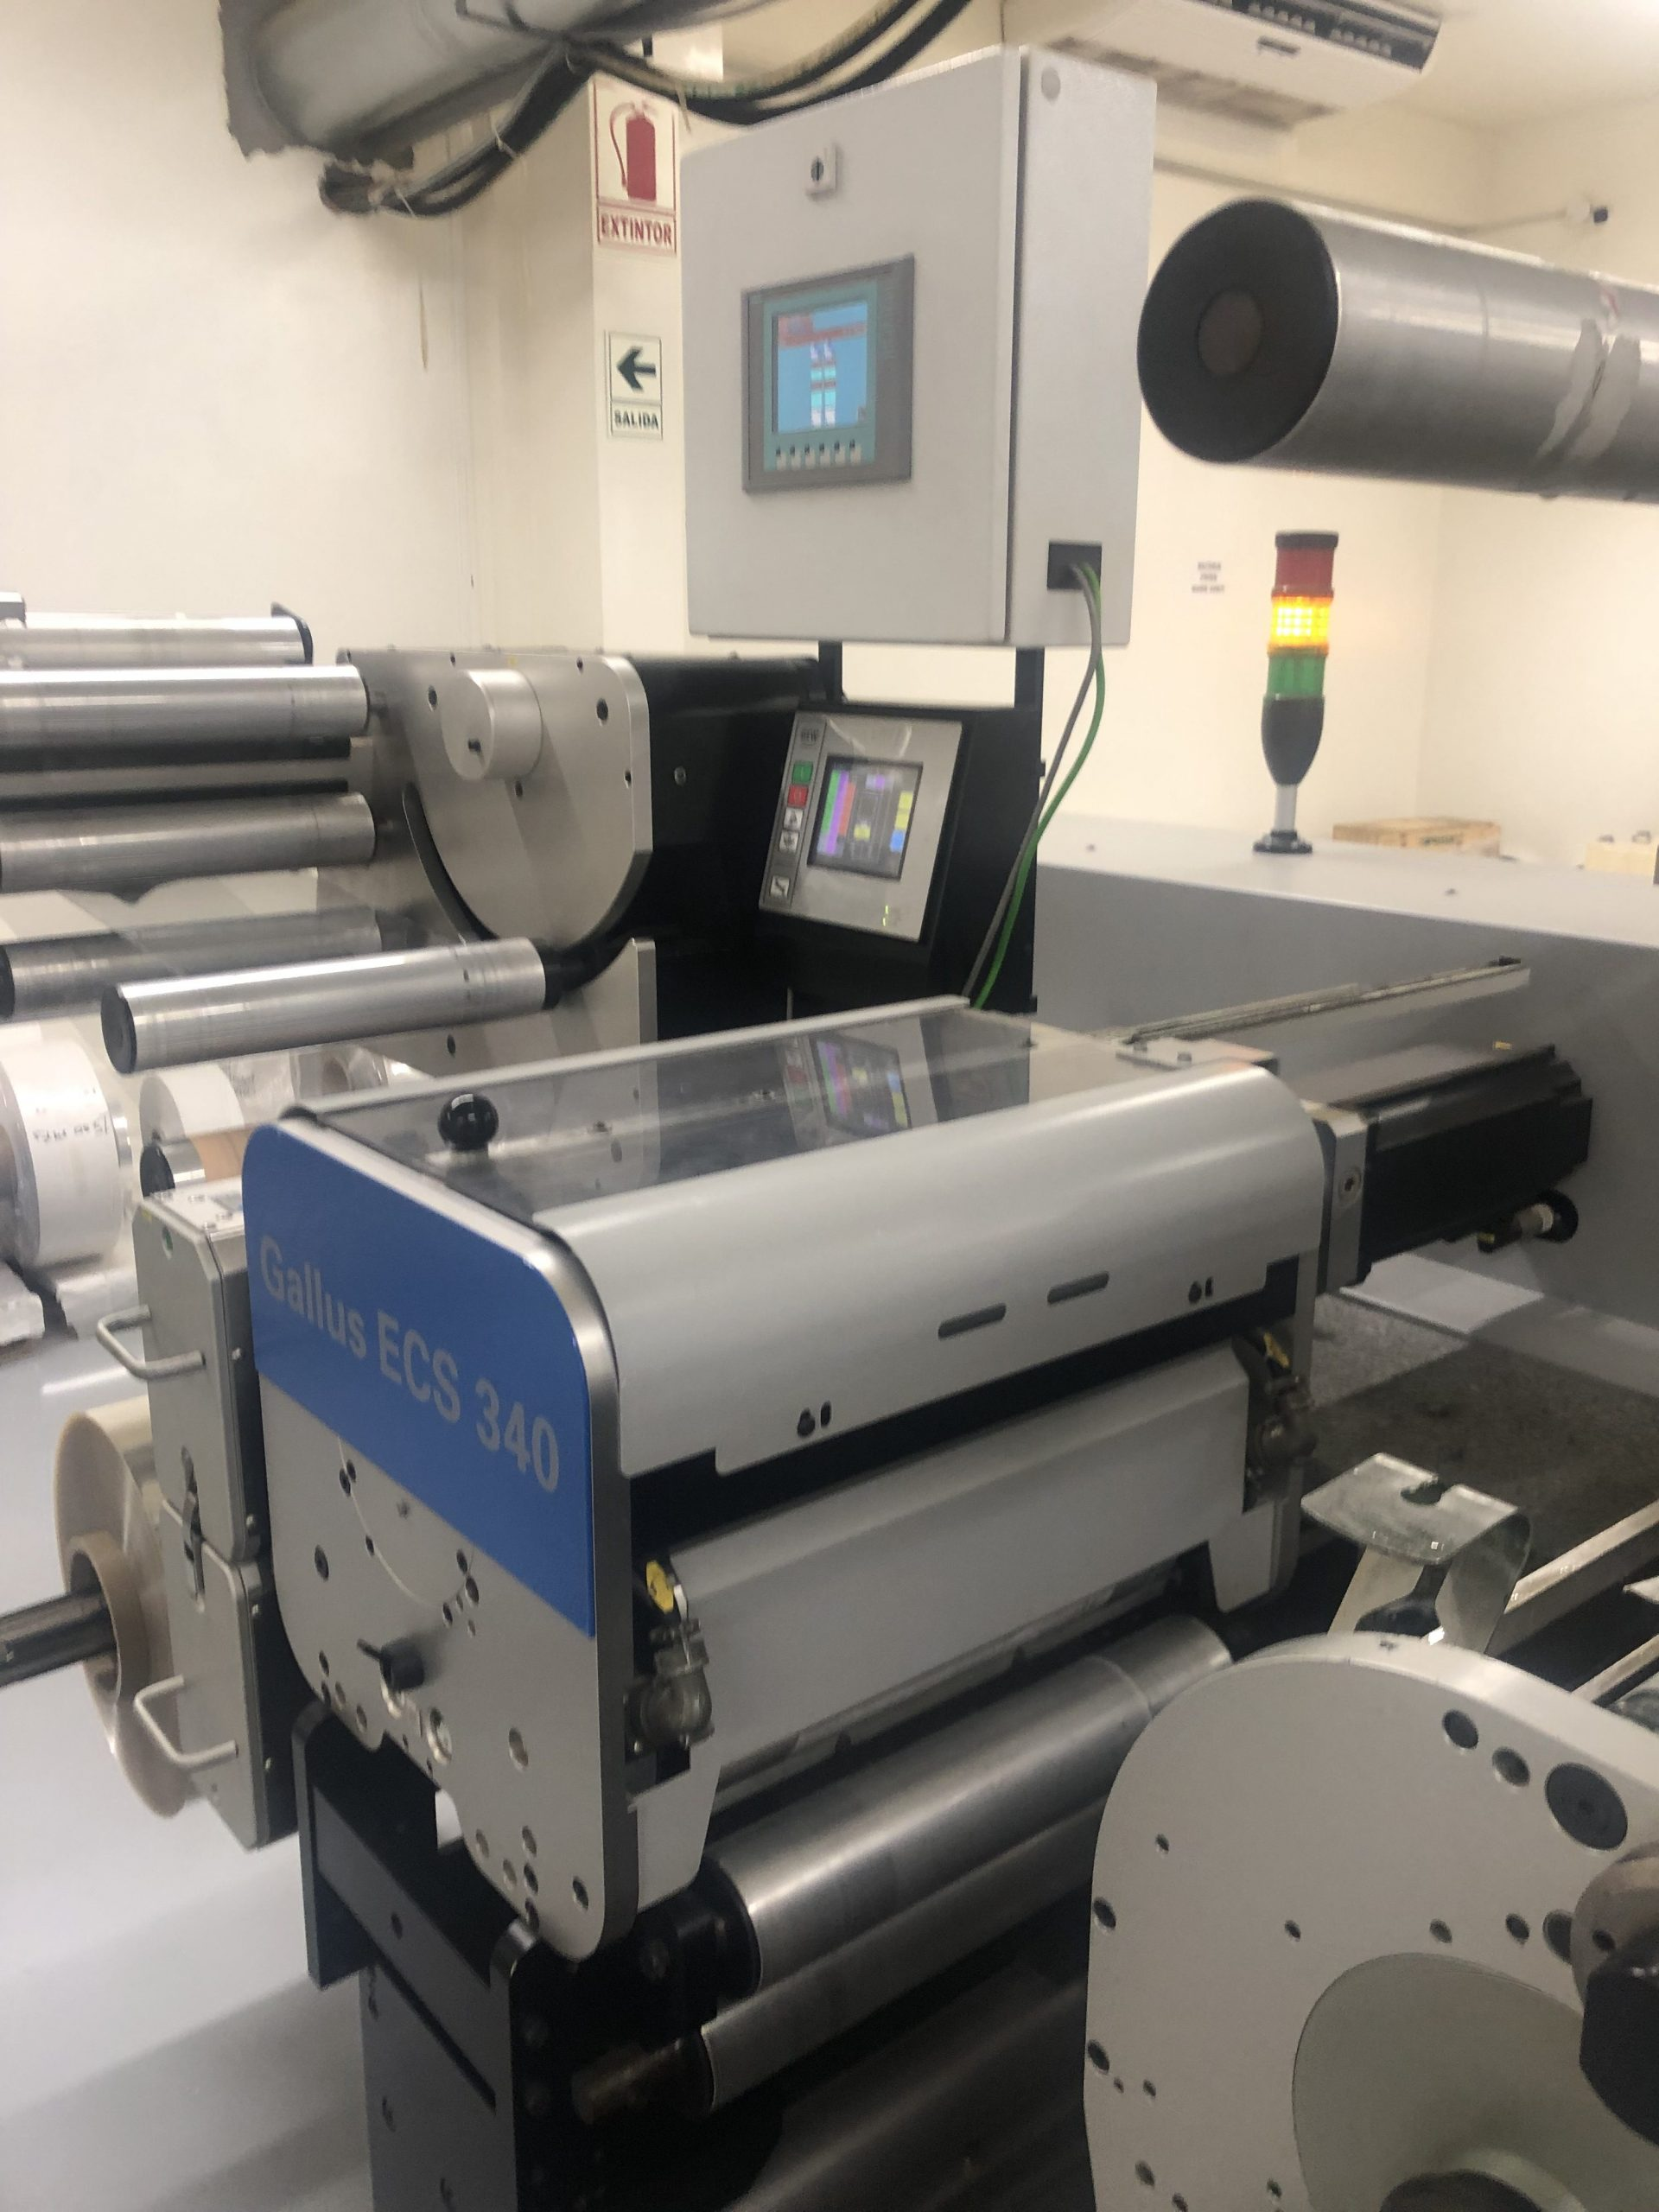 Gallus ECS340 - Used Flexo Printing Presses and Used Flexographic Equipment-3